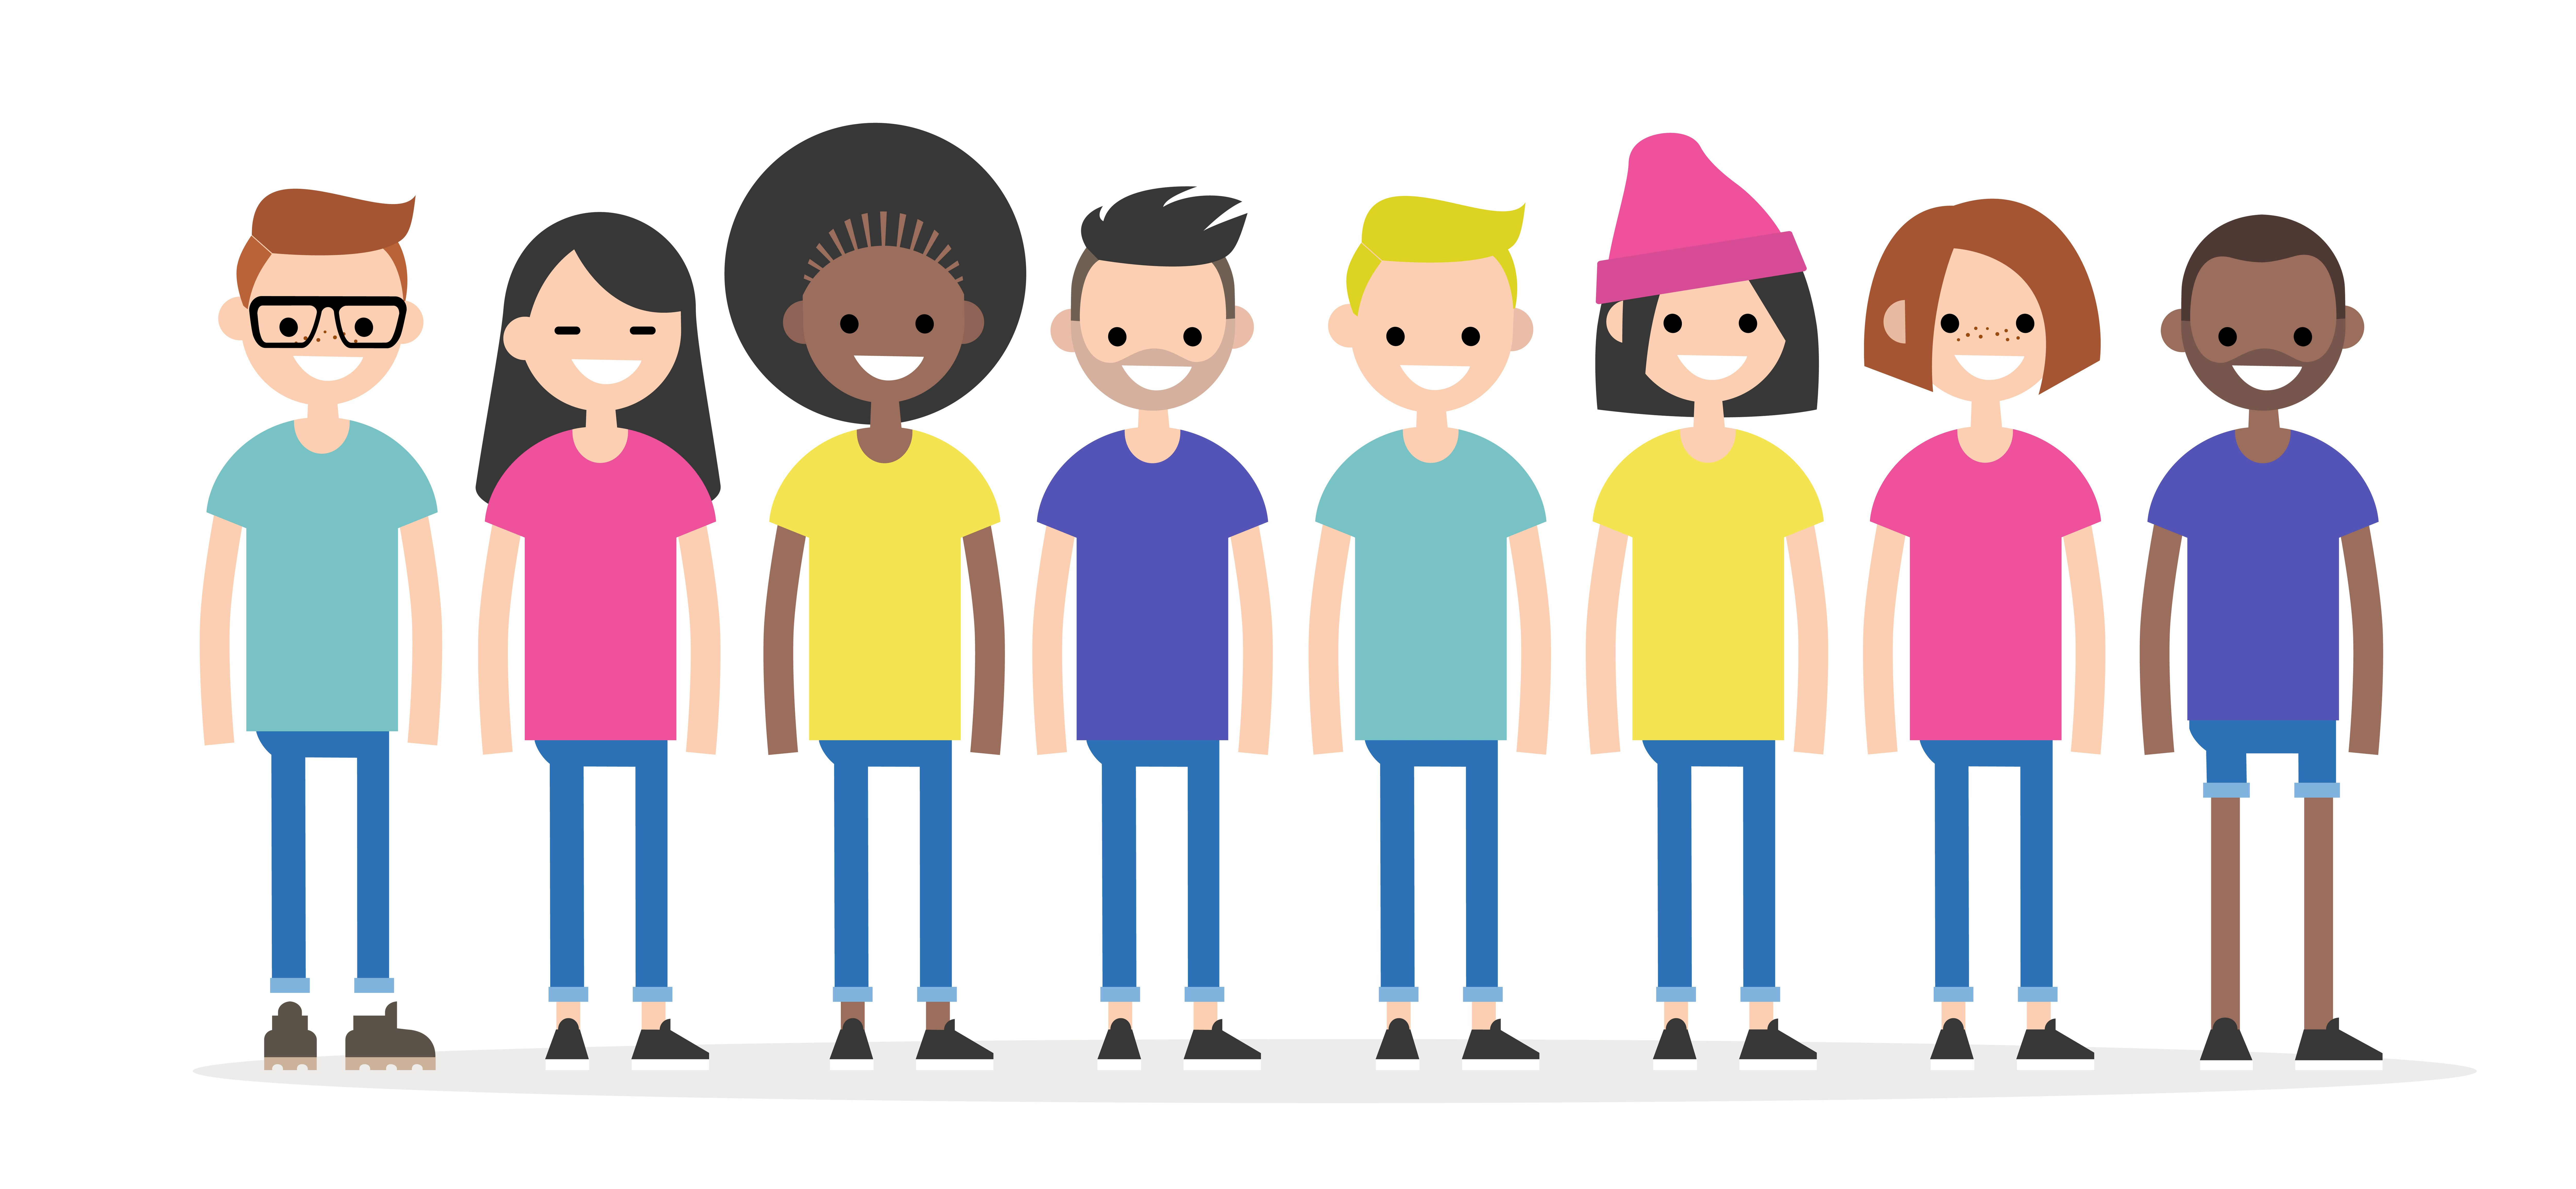 Collage of Gen Z Cartoon Individuals